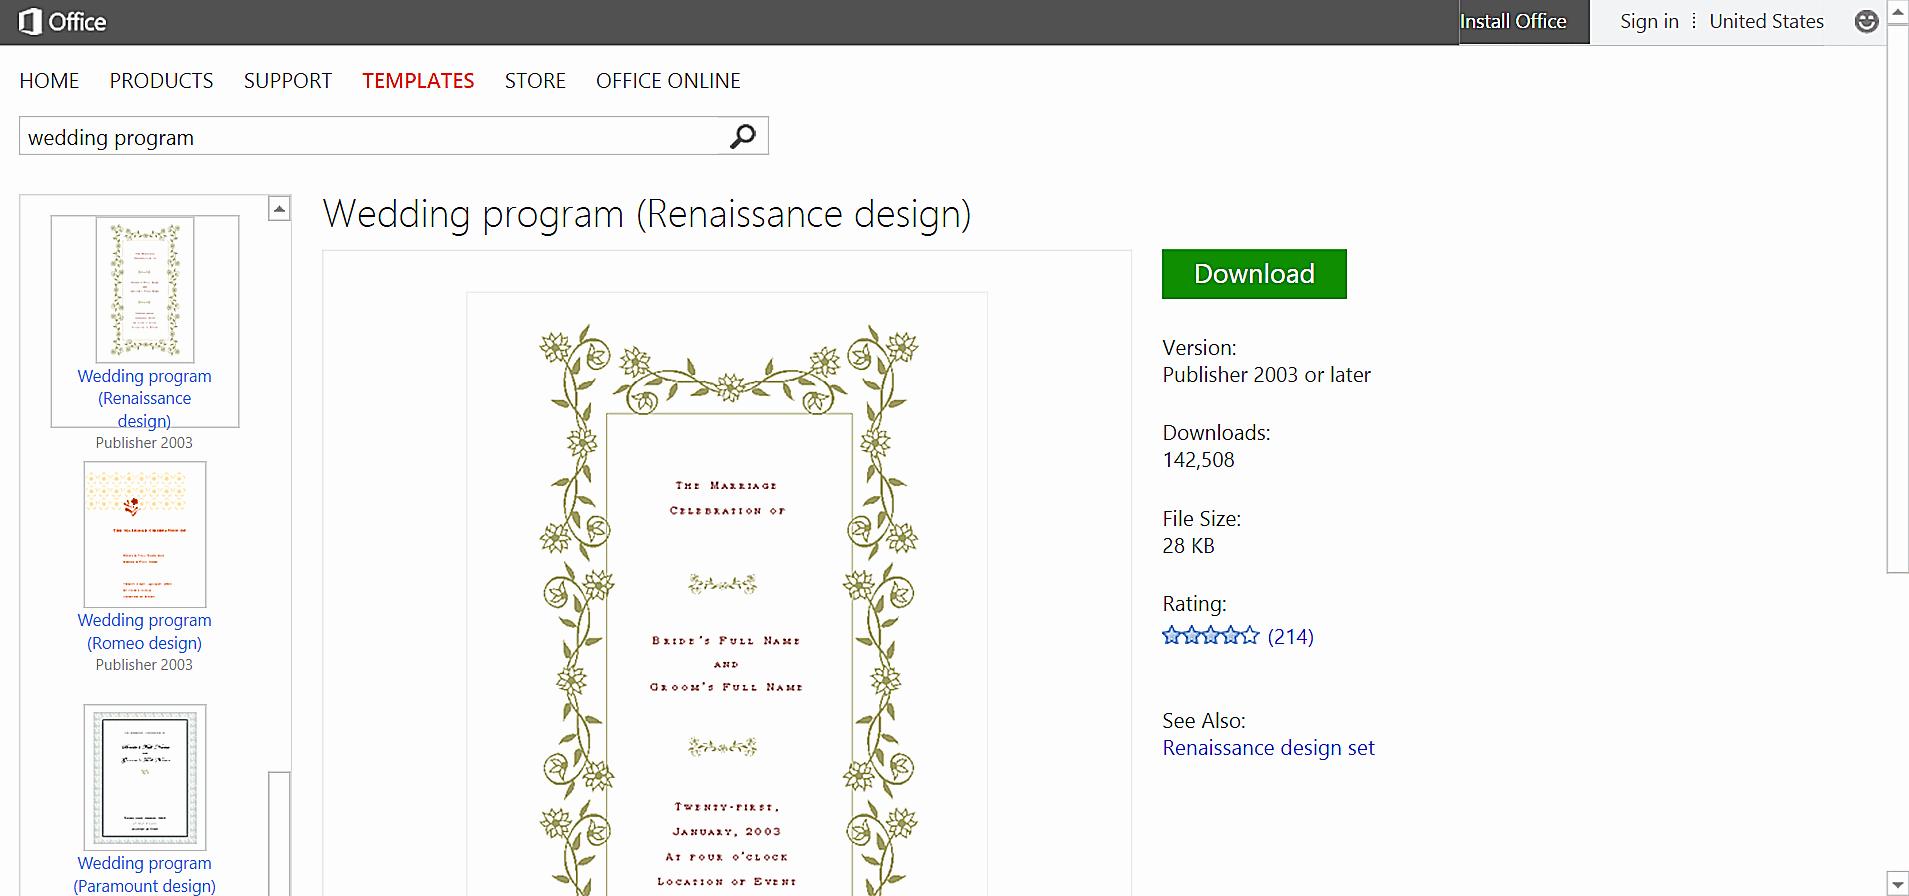 Wedding Program Templates Microsoft Word New Make Wedding Planning Easier Using Microsoft Fice